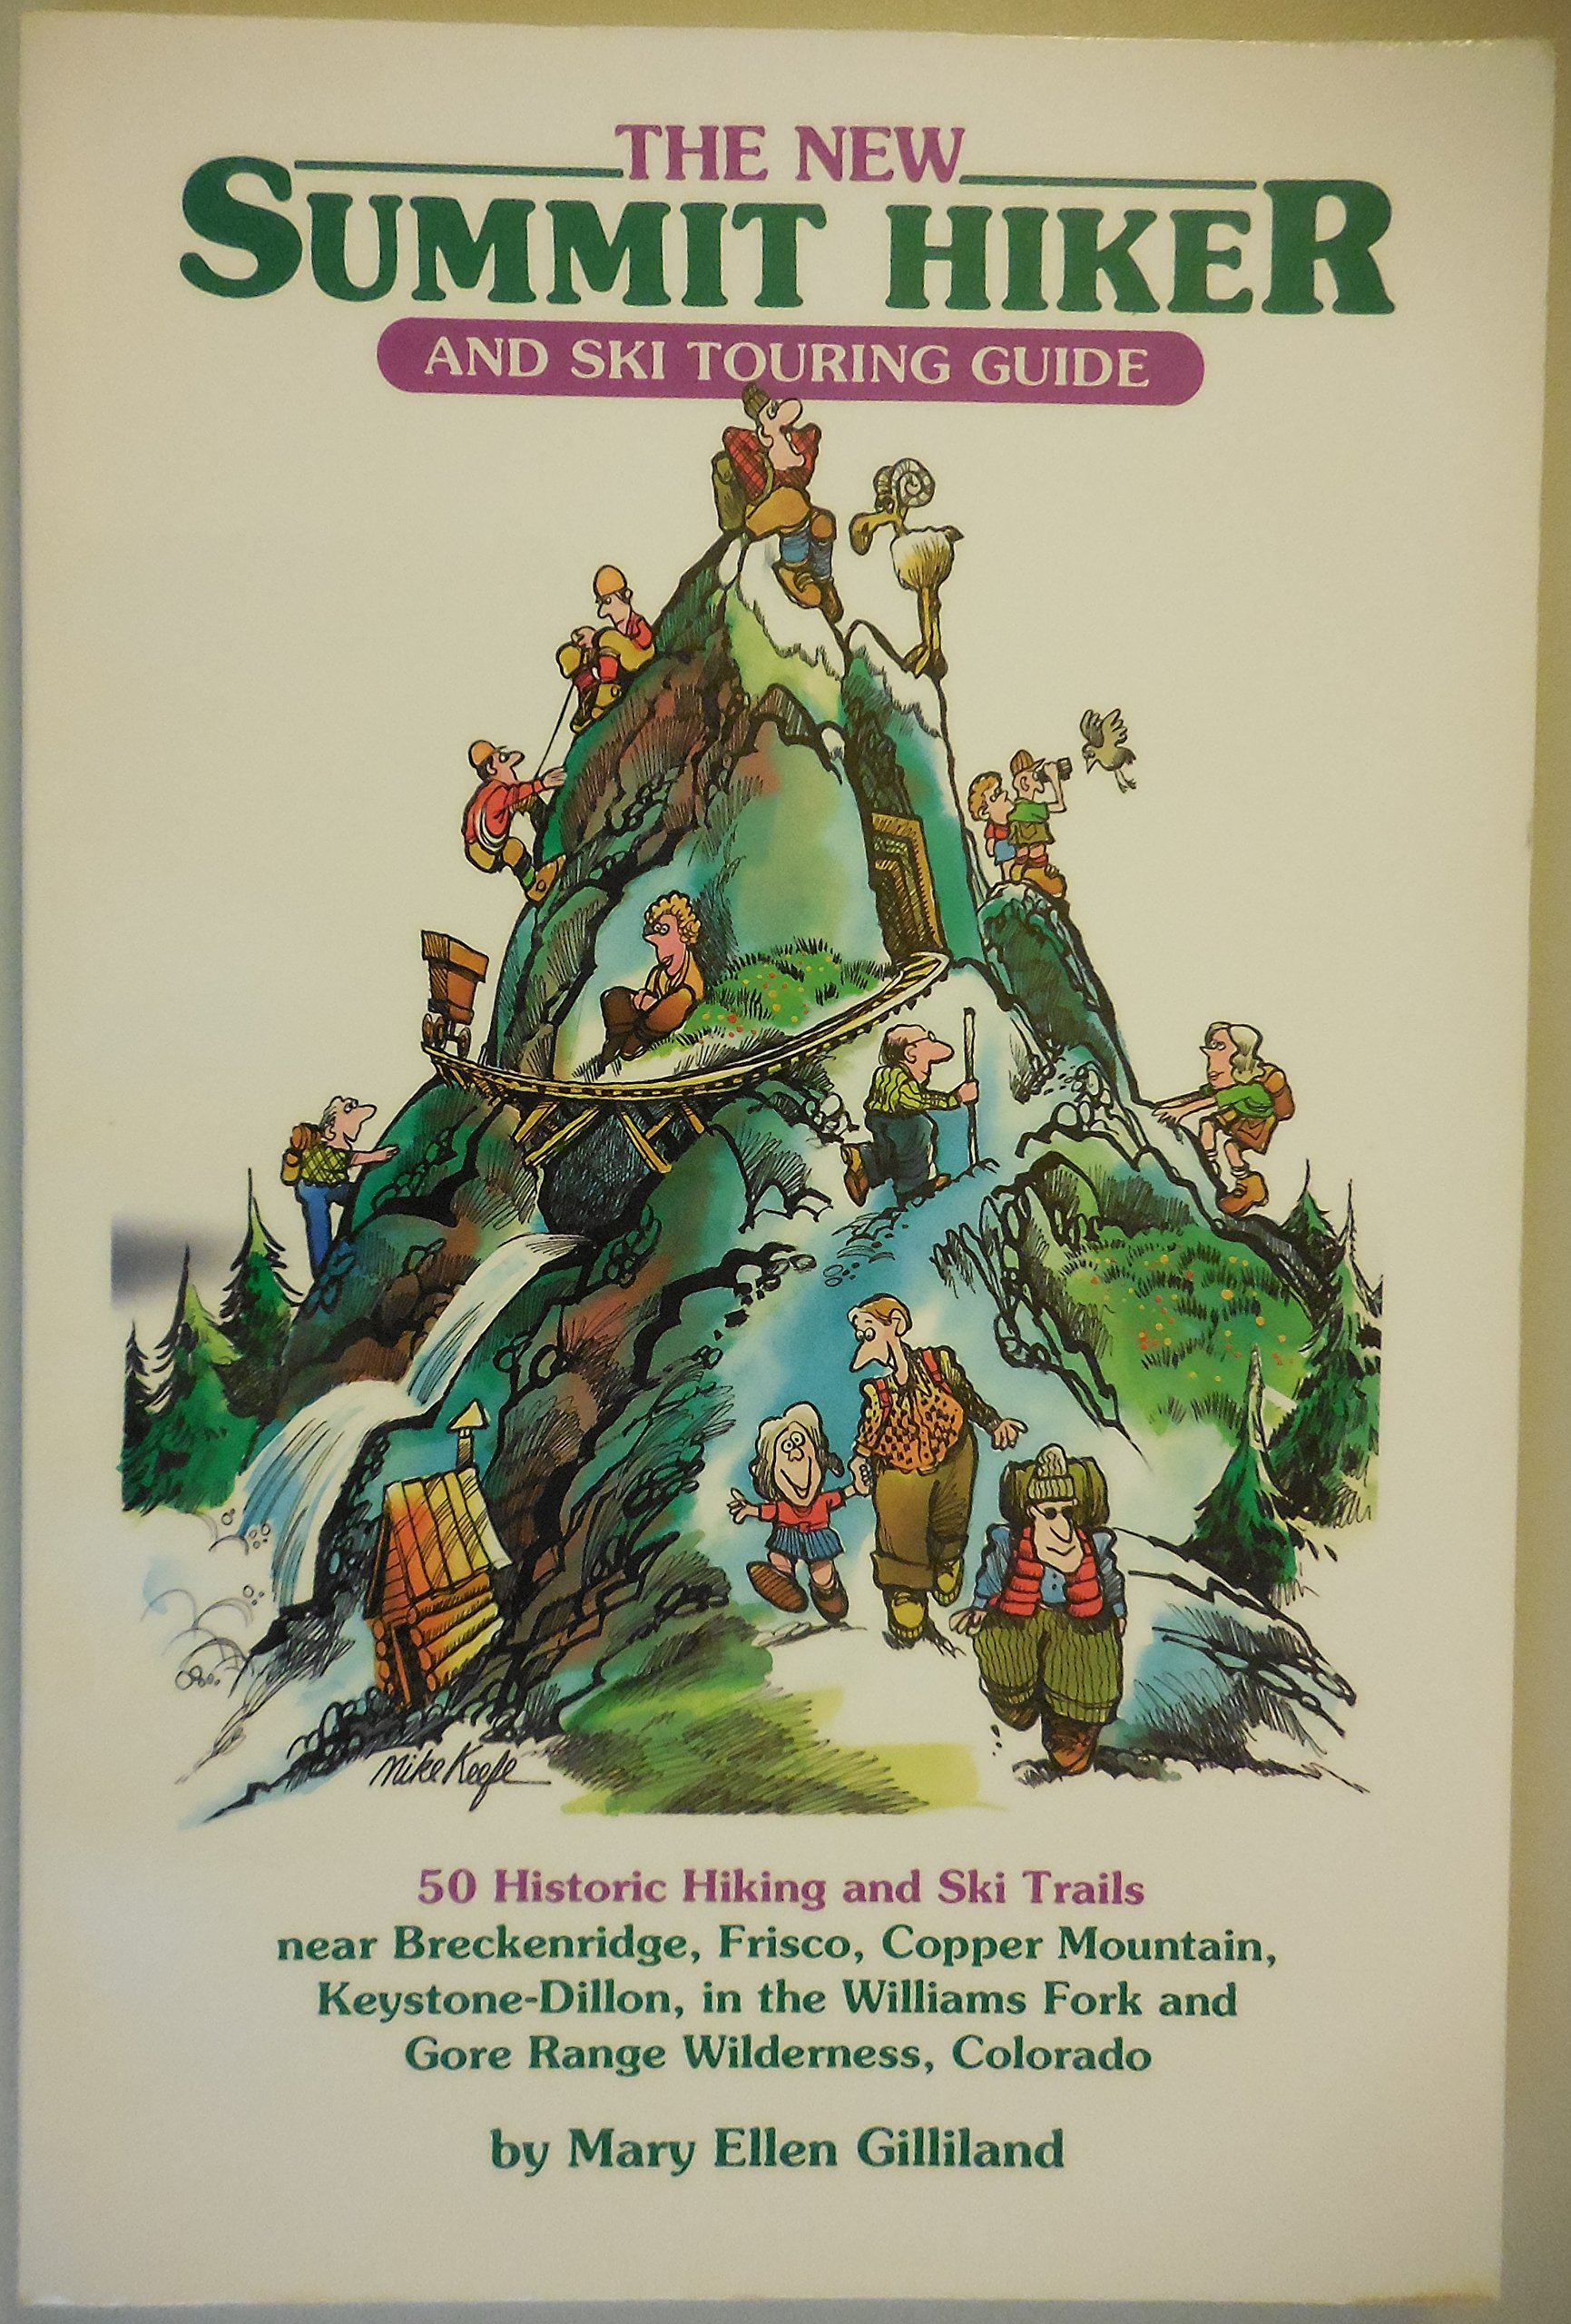 The Summit Hiker: 40 Historic Hiking and Skiing Trails Near ... on aspen hiking, keystone colorado atv, keystone colorado clothing, keystone colorado sledding, keystone colorado wildlife, keystone colorado mountains, keystone colorado shopping, breckenridge hiking, new york hiking, yosemite national park hiking, grand canyon hiking, keystone colorado tubing, keystone colorado golf,